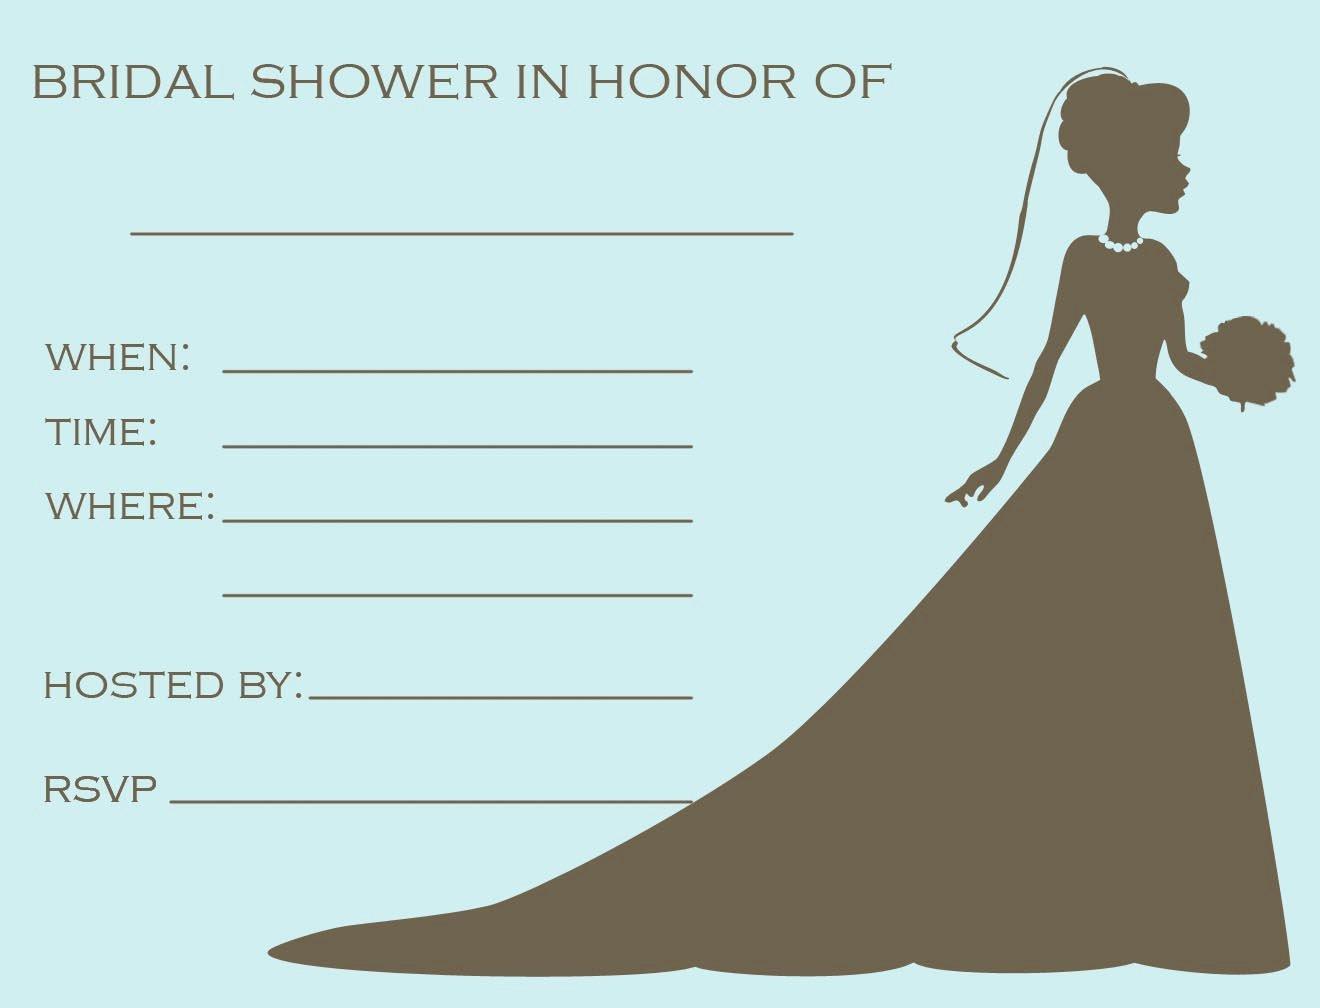 Bridal Shower Invitations Template Inspirational 12 Mesmerizing Free Bridal Shower Flyer Templates Demplates